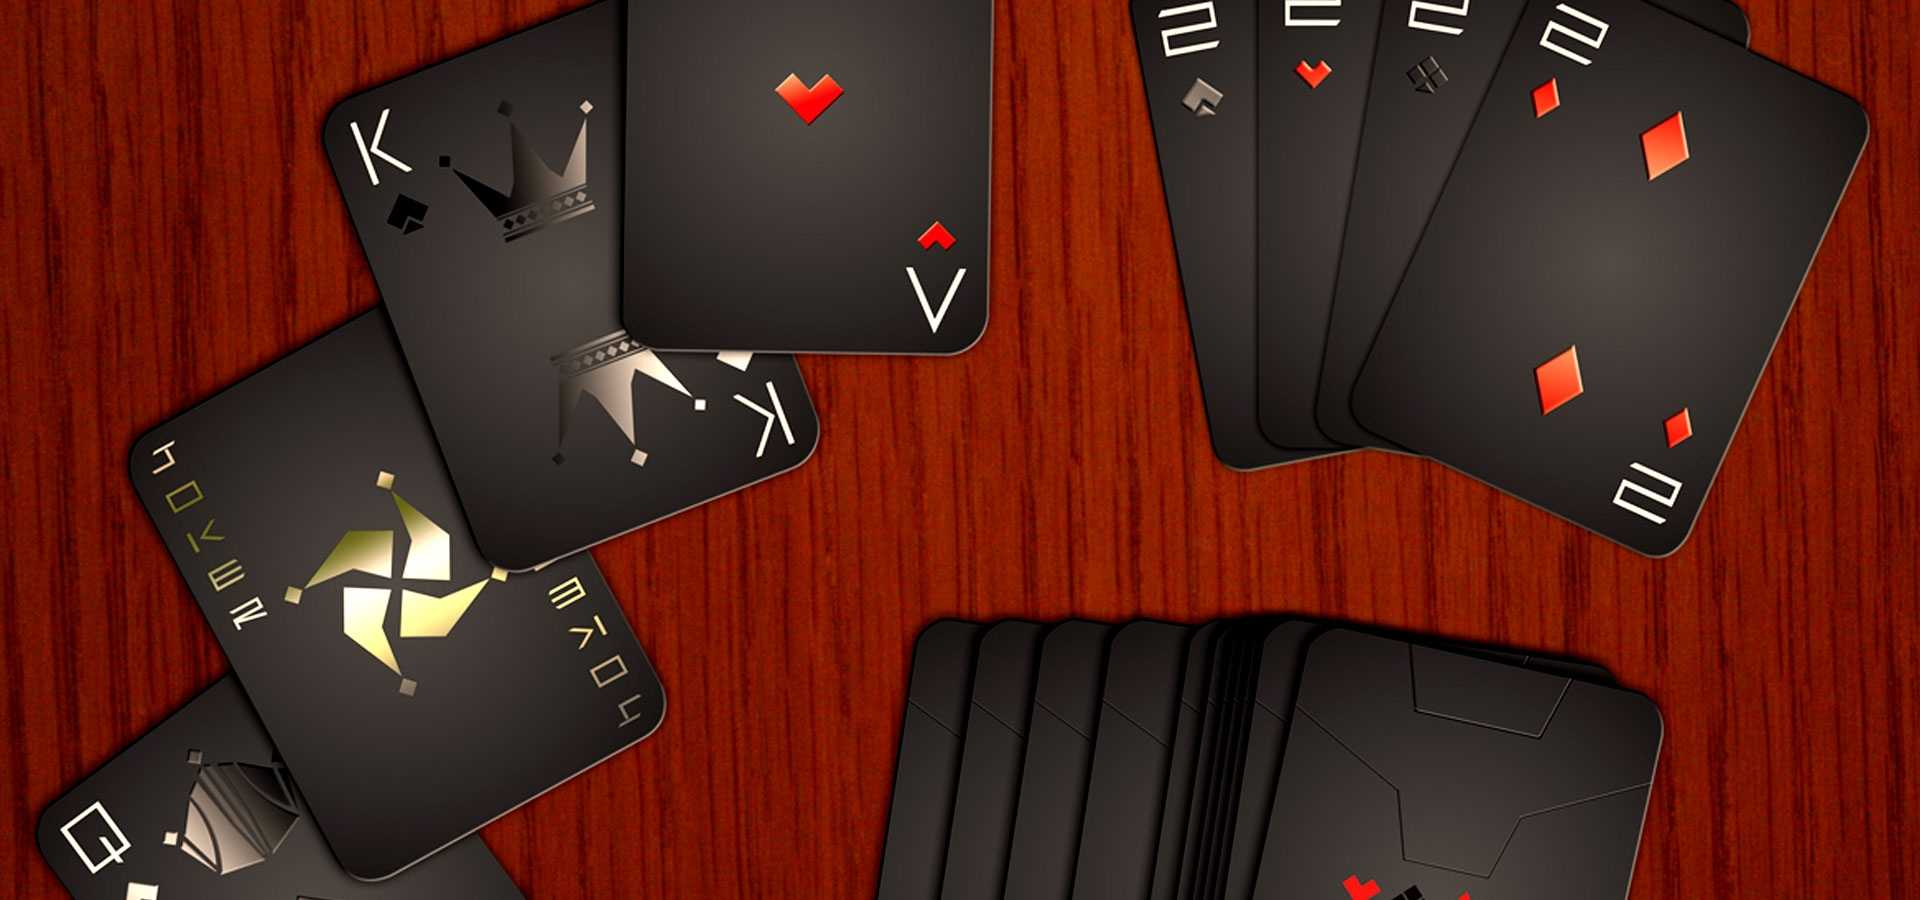 22+ Playing Card Designs | Free & Premium Templates intended for Playing Card Design Template